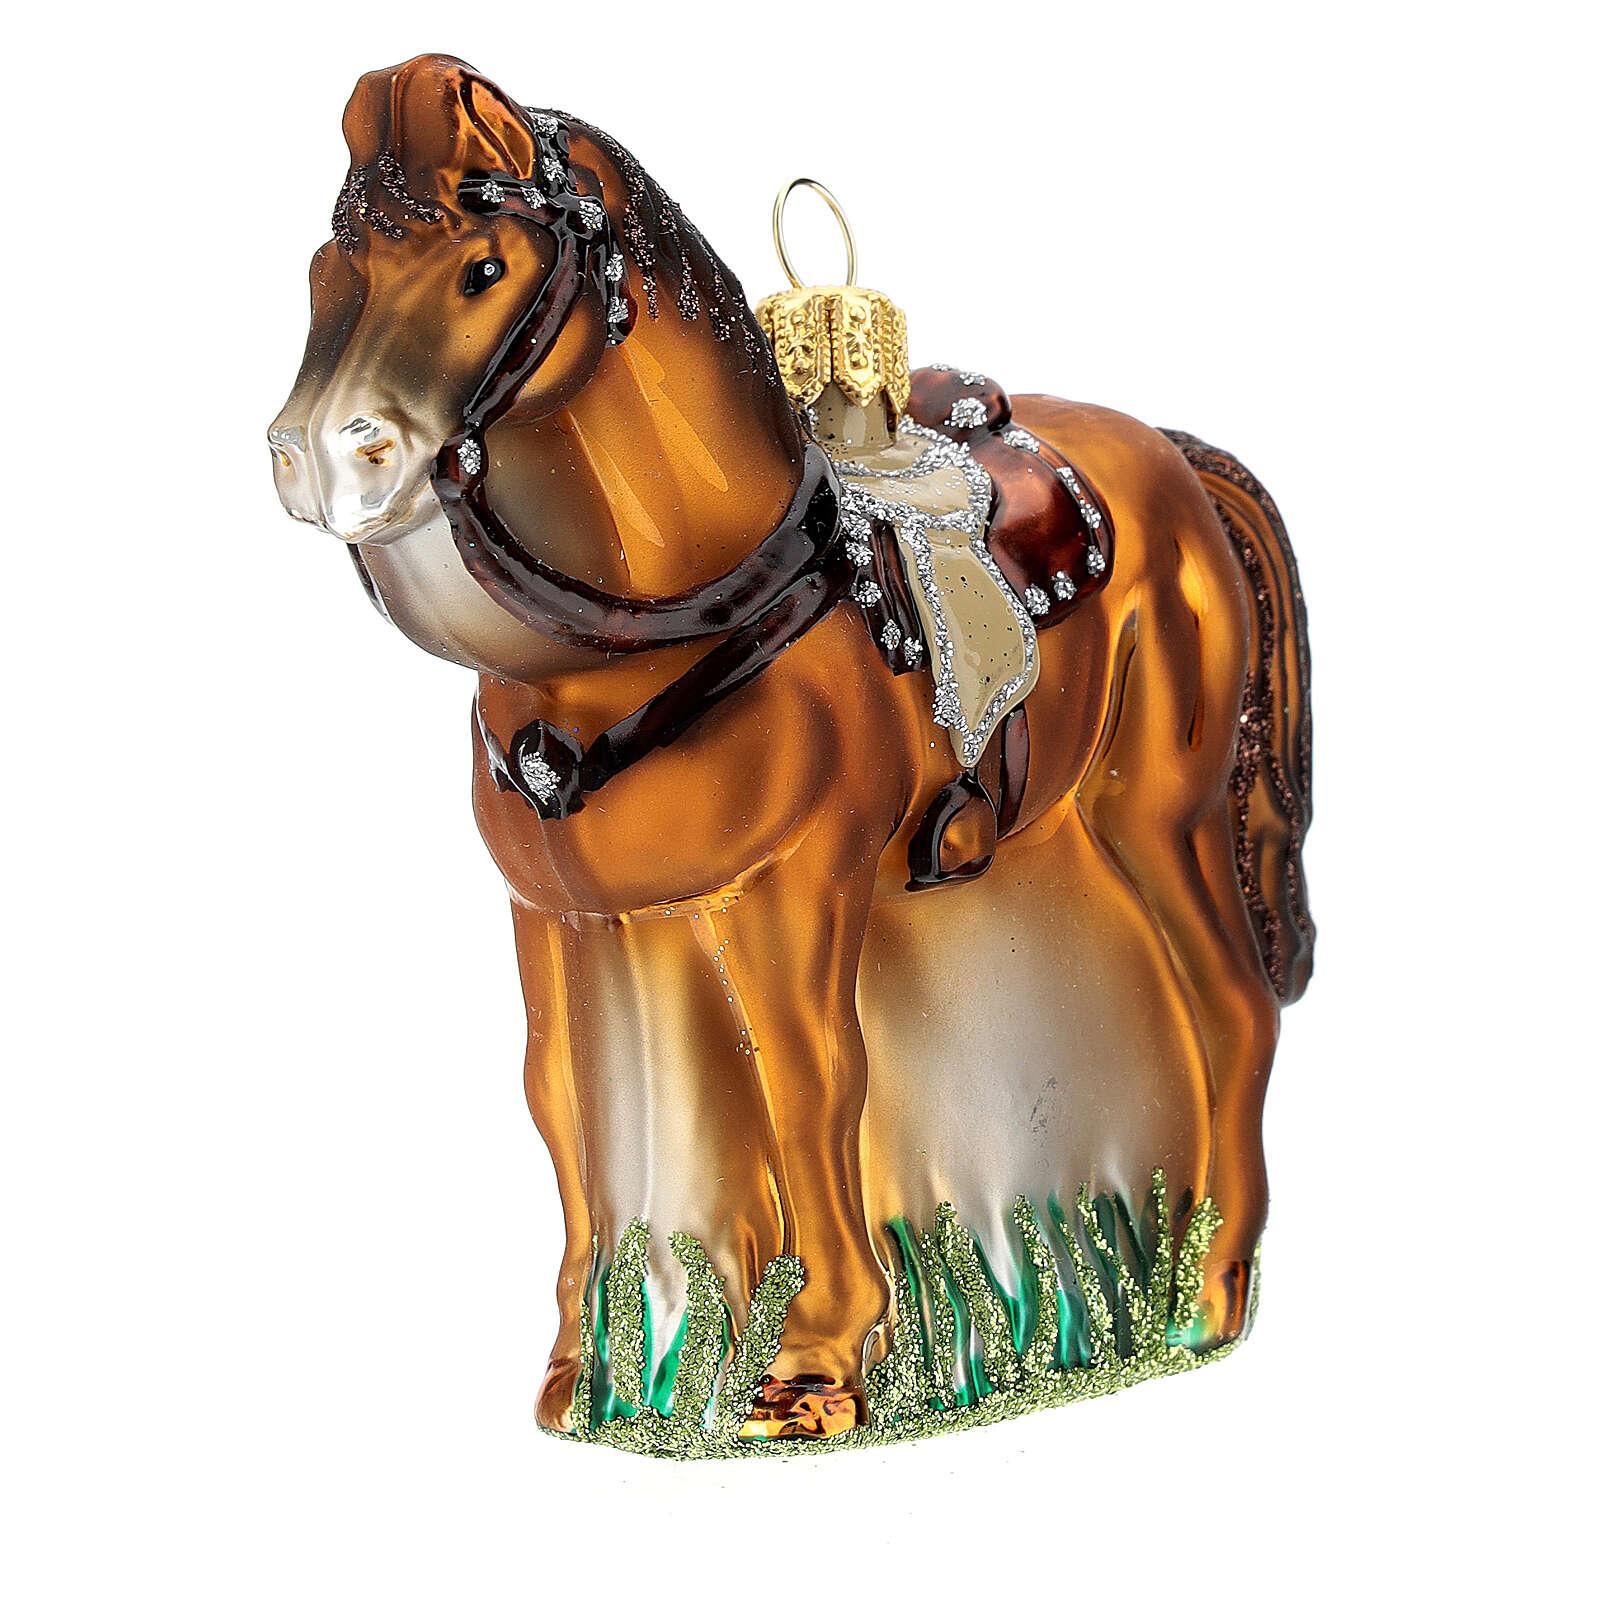 Blown glass Christmas ornament, saddled horse 4